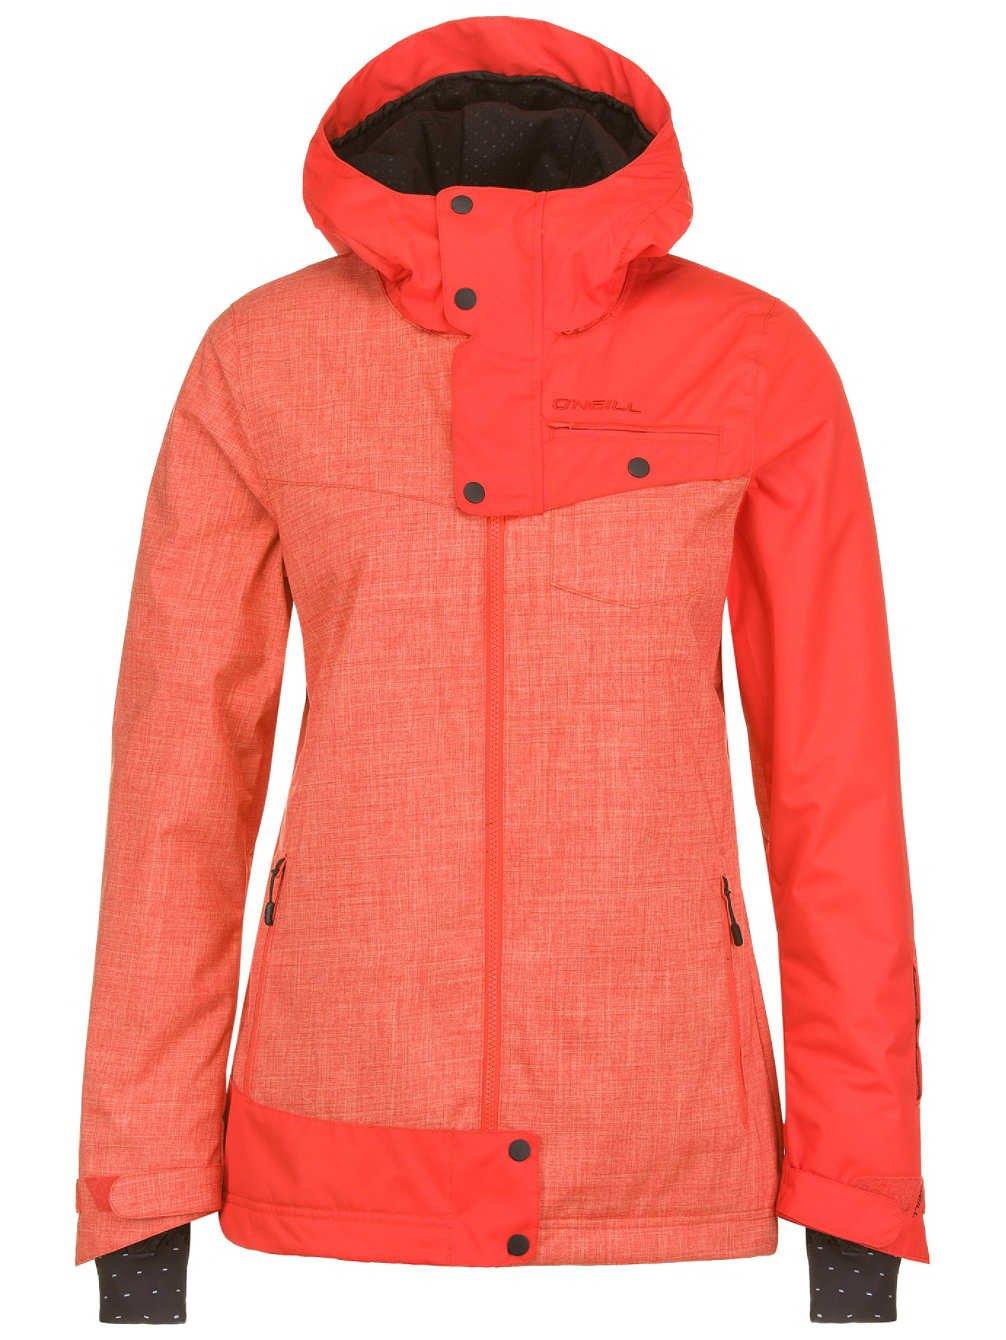 Damen Snowboardjacke Queue Jacket red